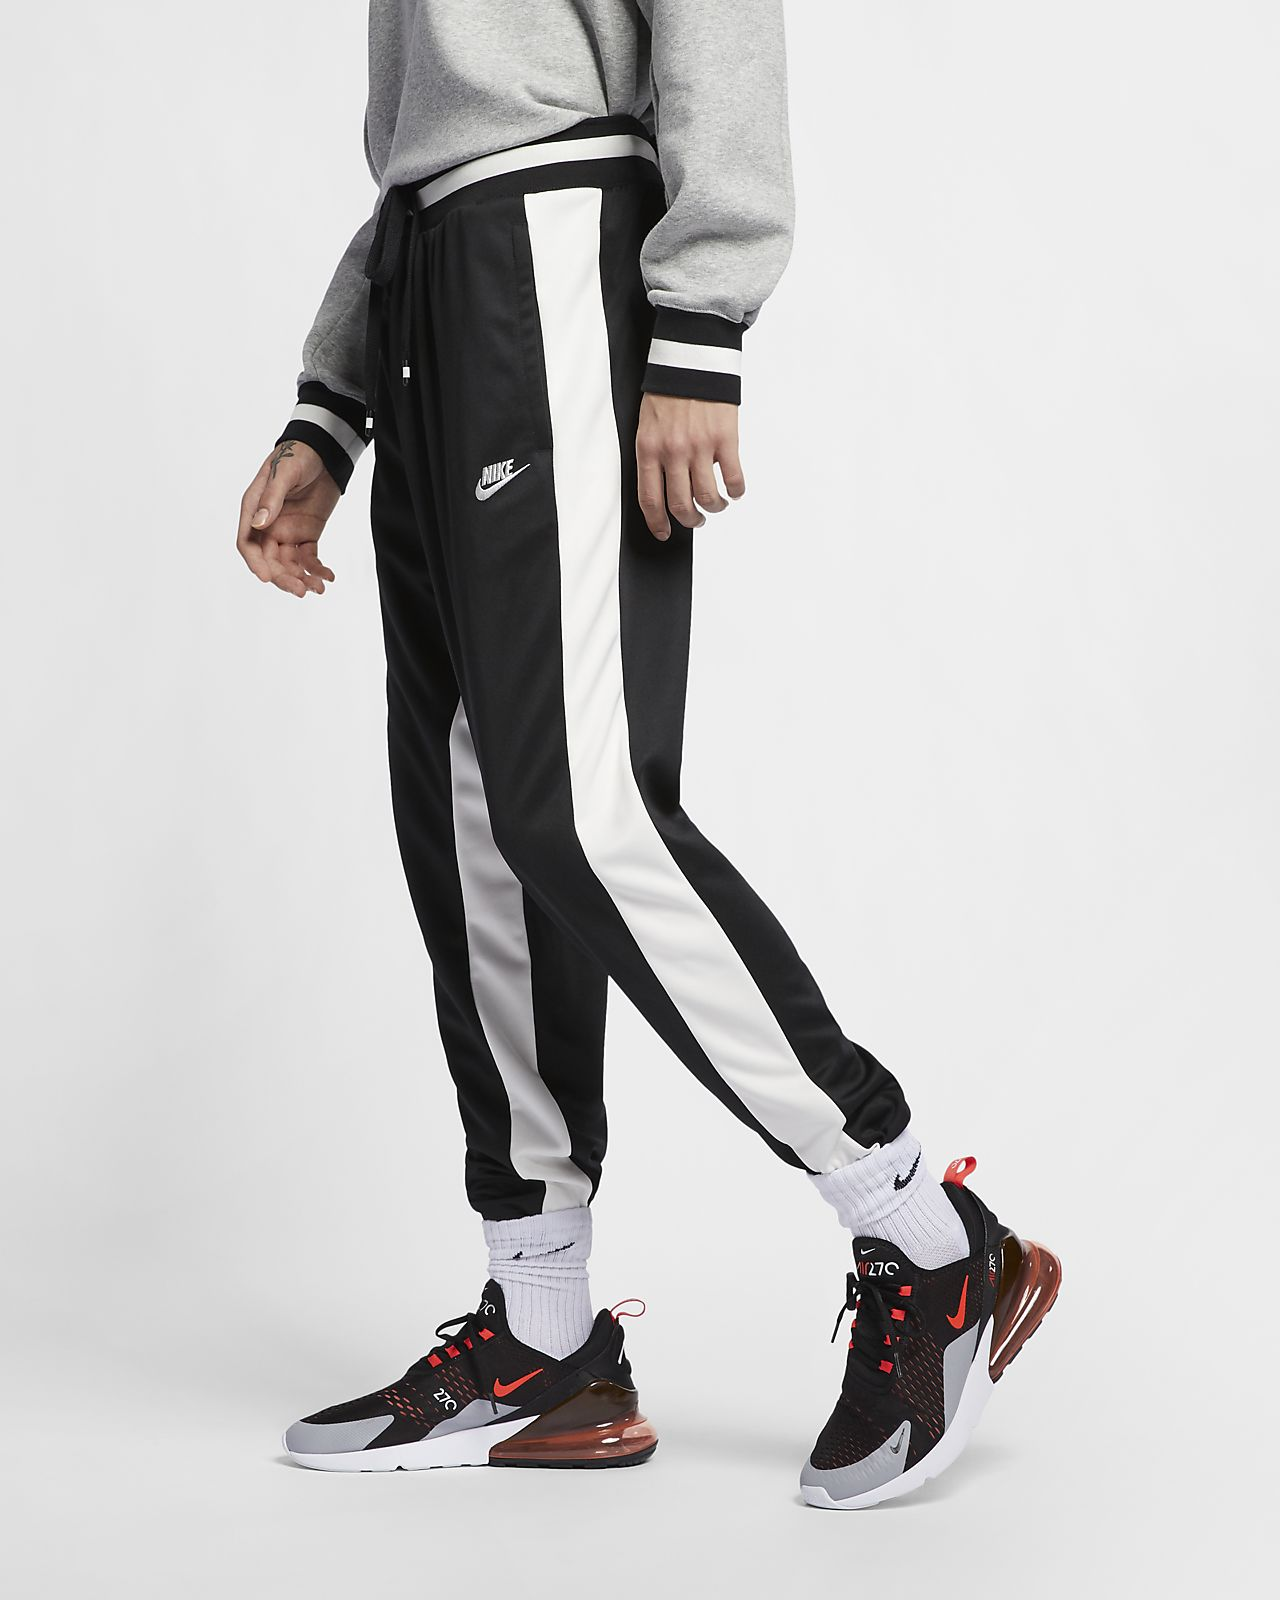 Pánské kalhoty Nike Air